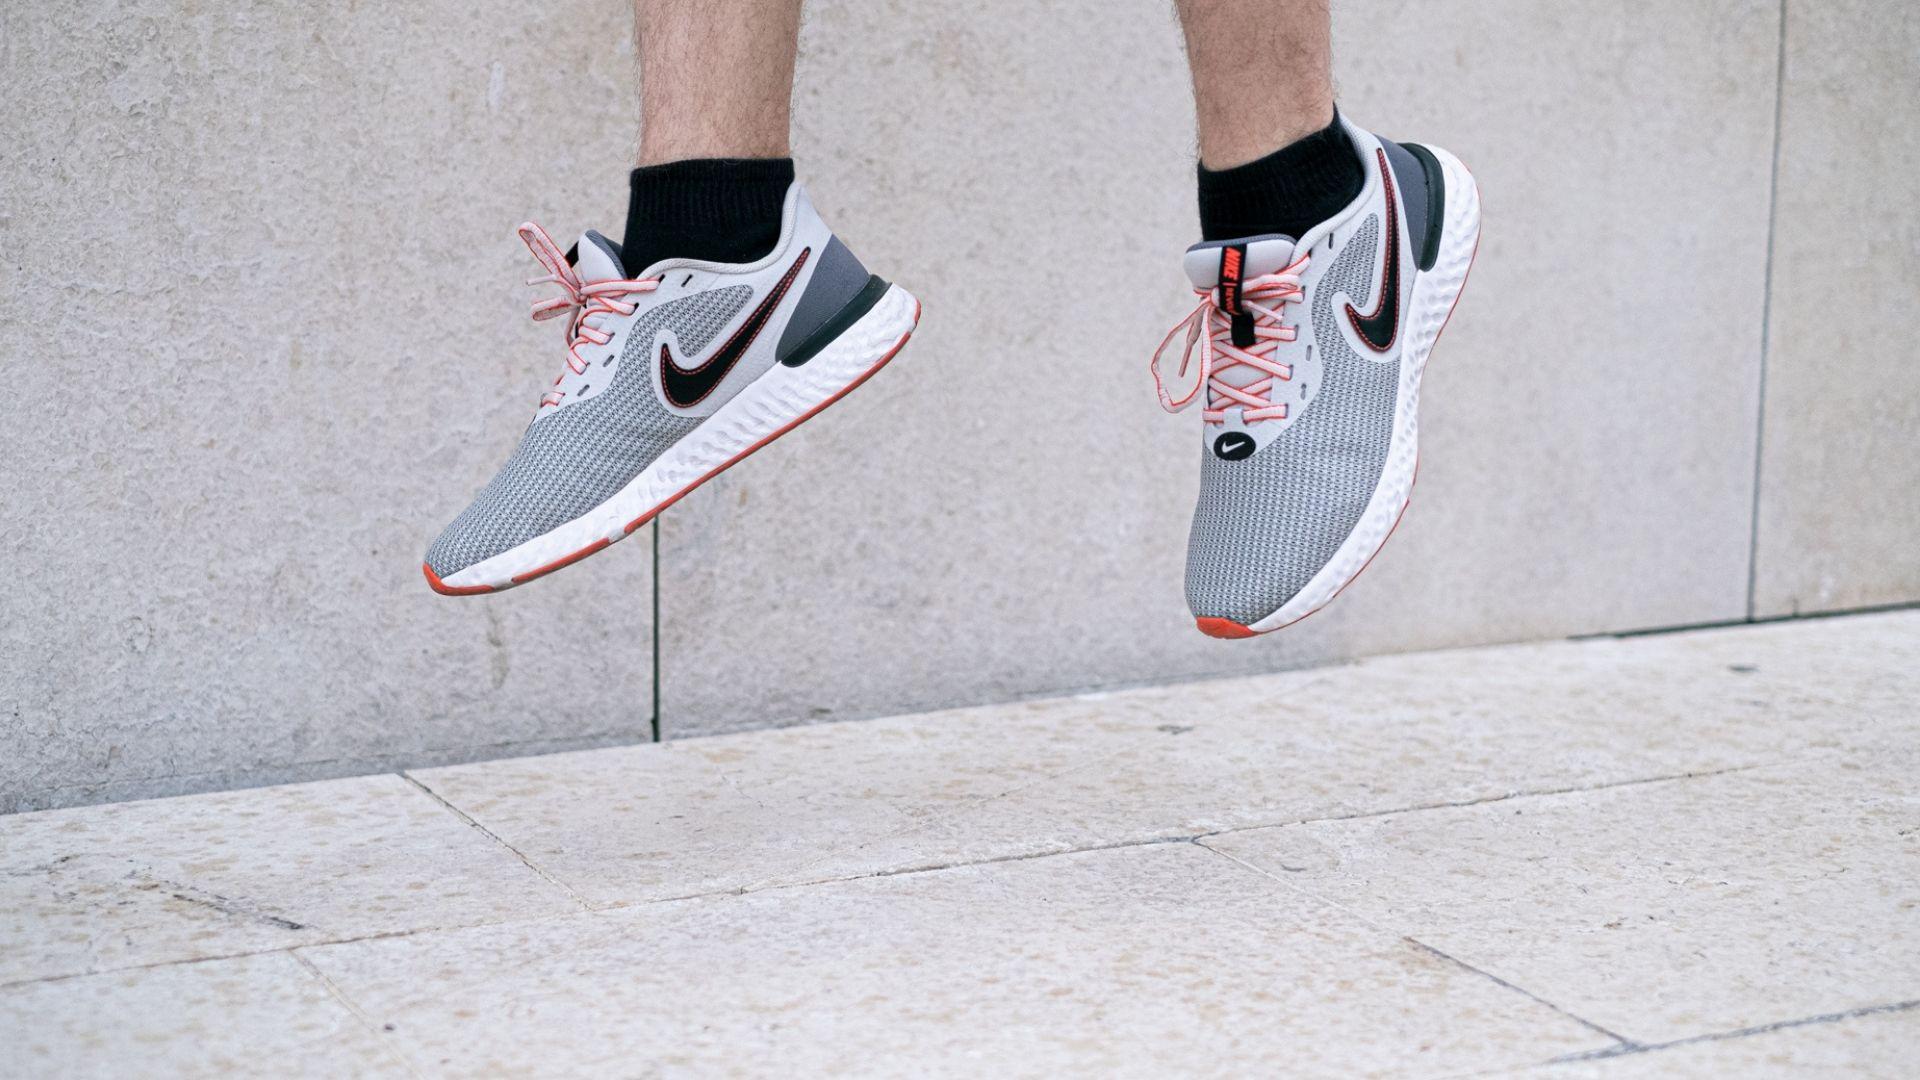 3 Nike Revolution 5 Test - Erfahrung